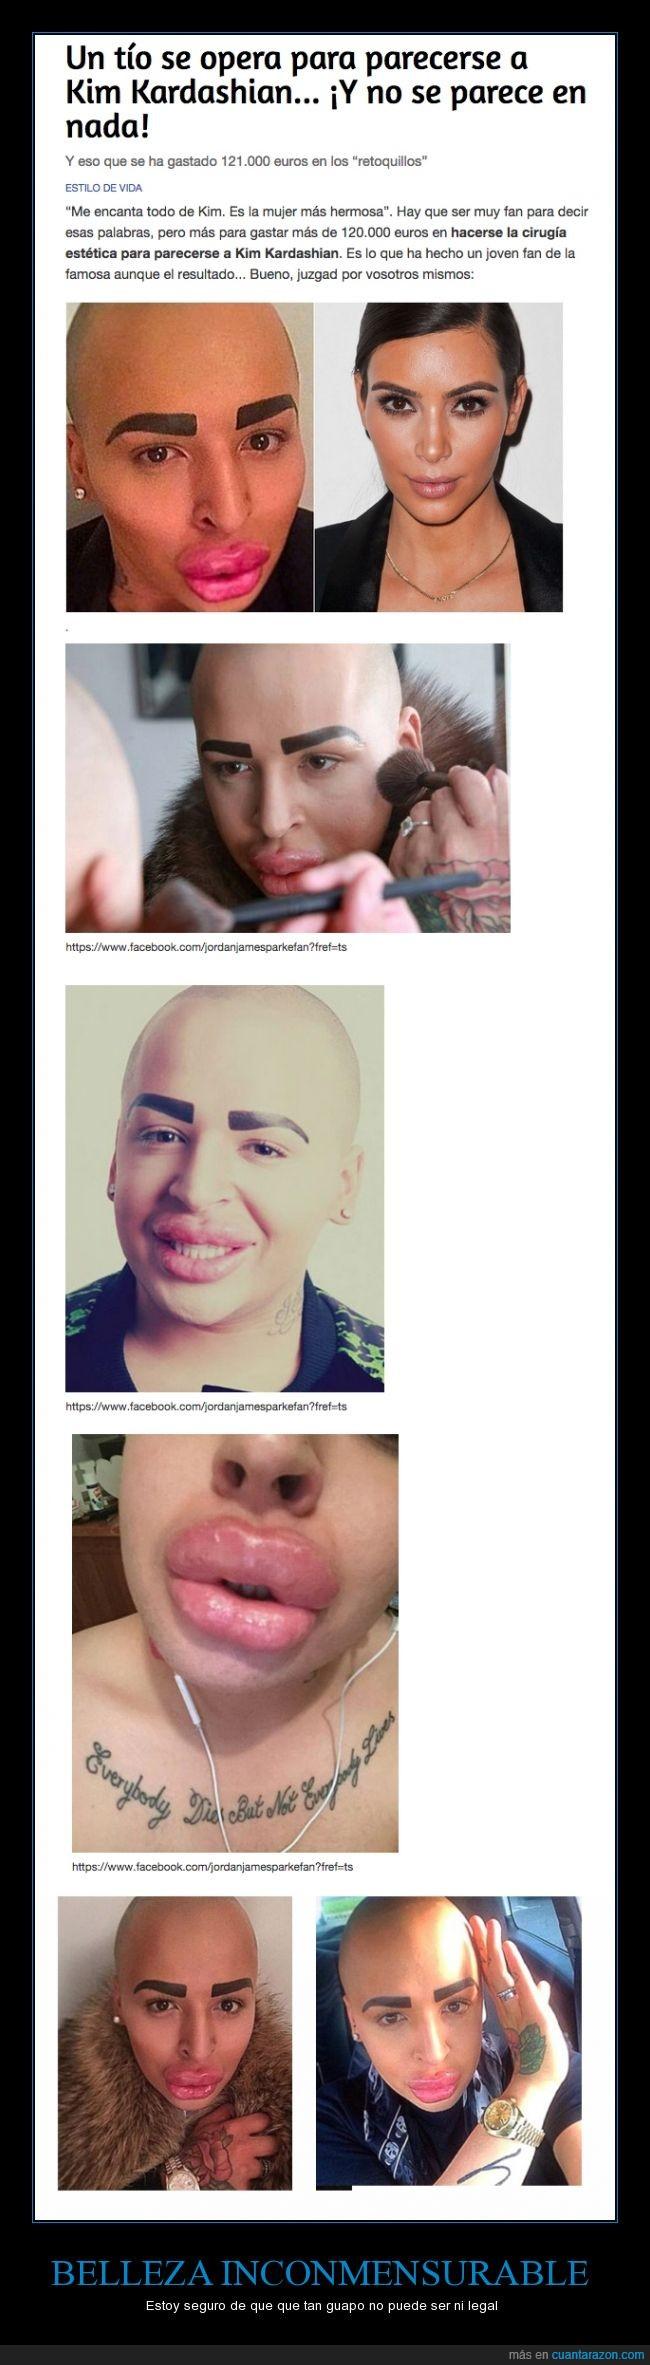 botox,cejas,chico,feo,guapo,Jordan James Parke,Kim Kardashian,labios,maquillador